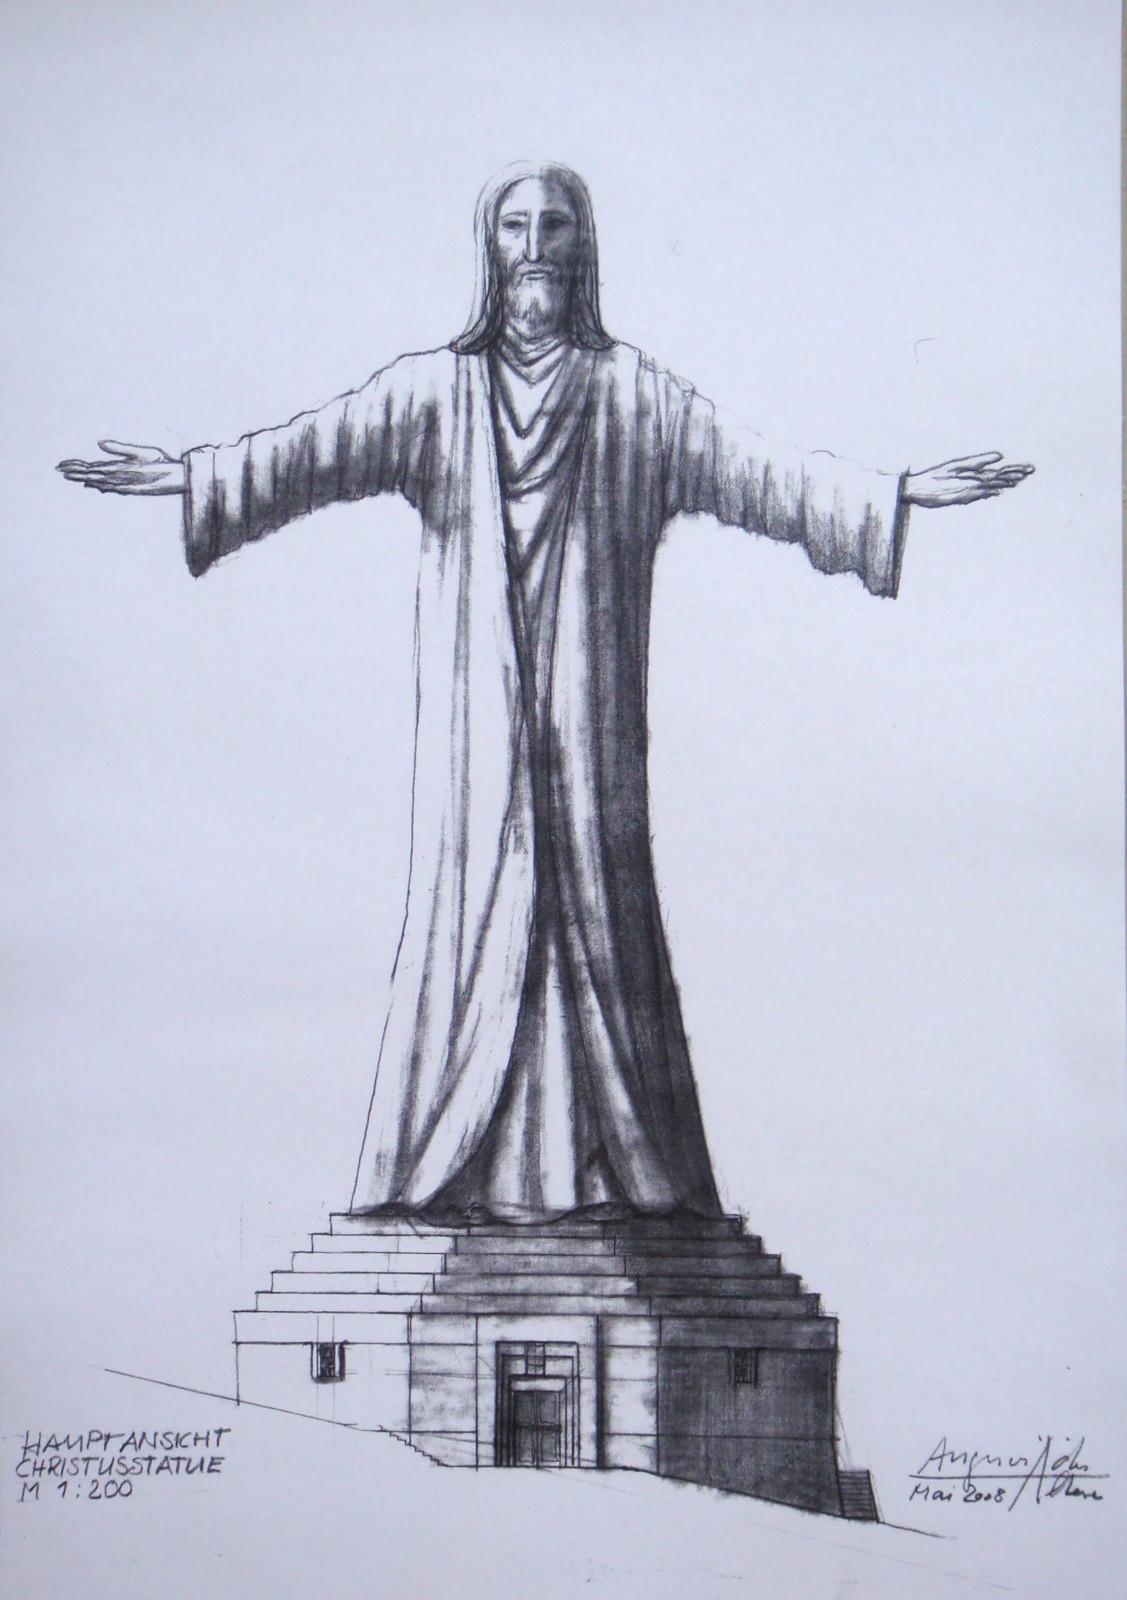 Christus_Statue_Hauptansicht_1